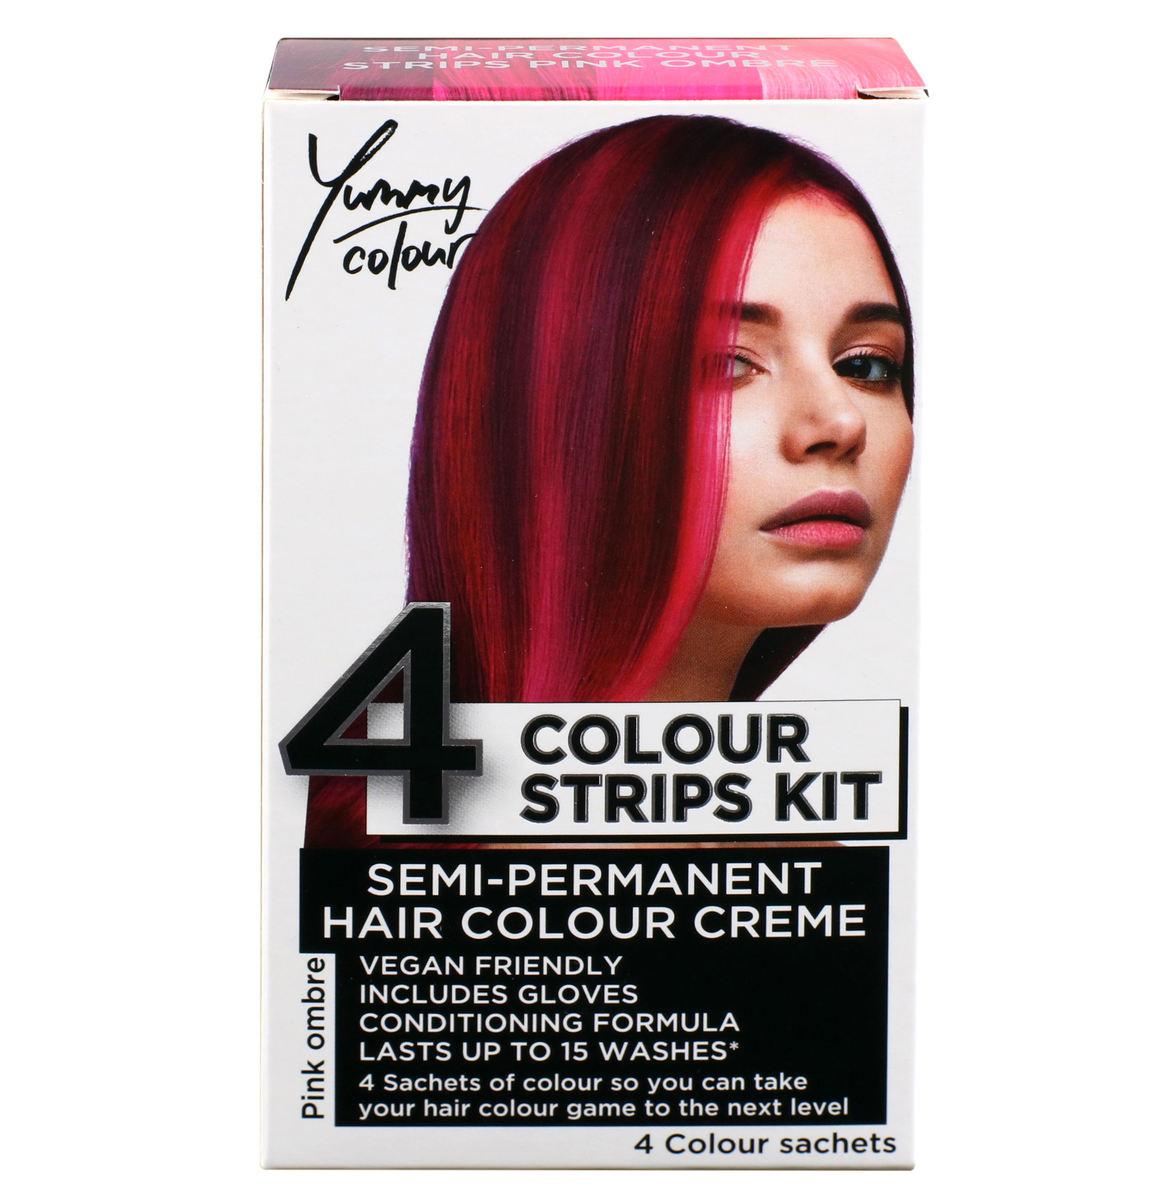 farba na vlasy STAR GAZER - Yummy Colour 4 Color Strips Kit - Pink - SGS234Ombr